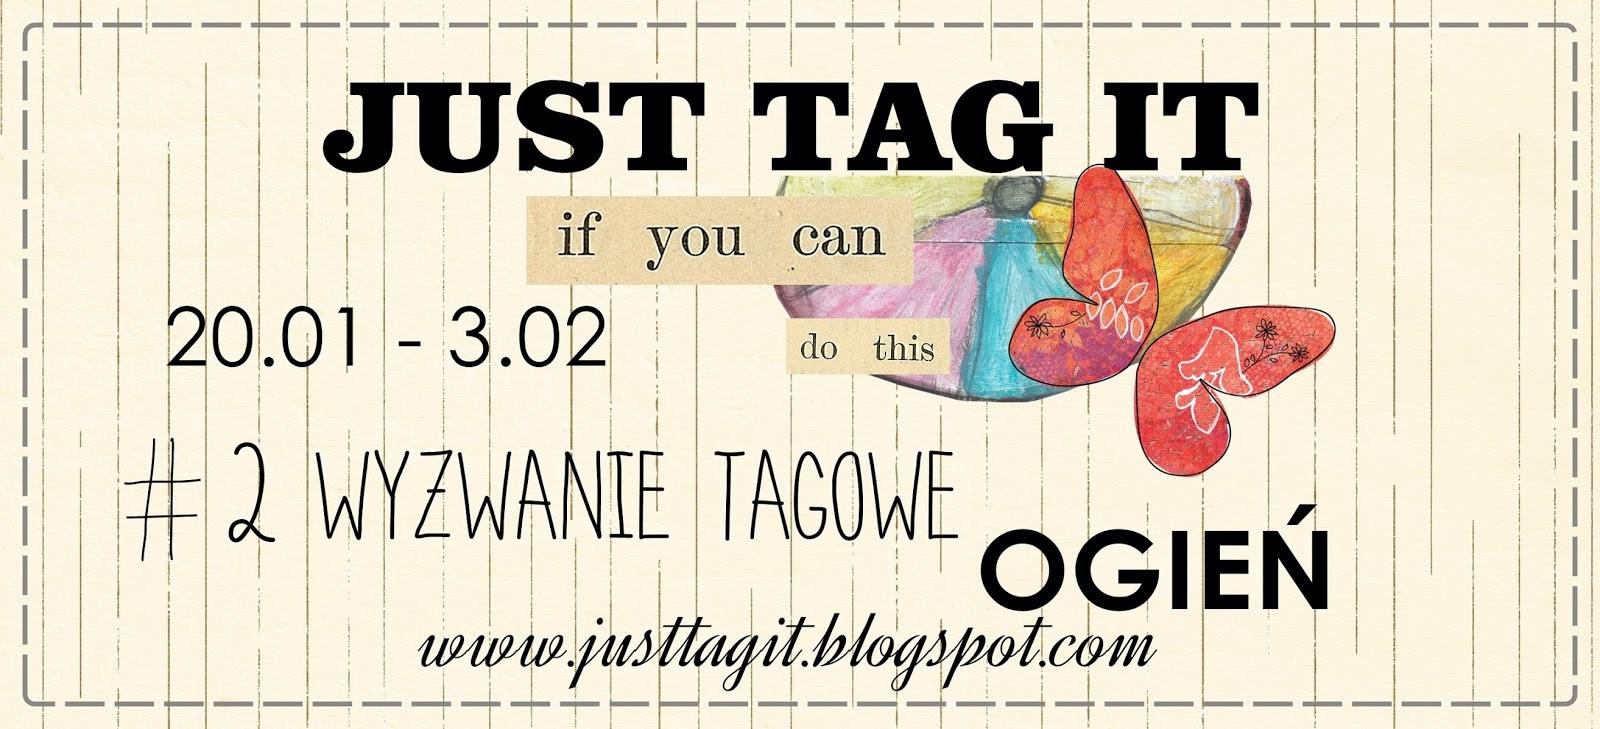 http://justtagit.blogspot.com/2015/01/2-wyzwanie-tagowe-ogien.html